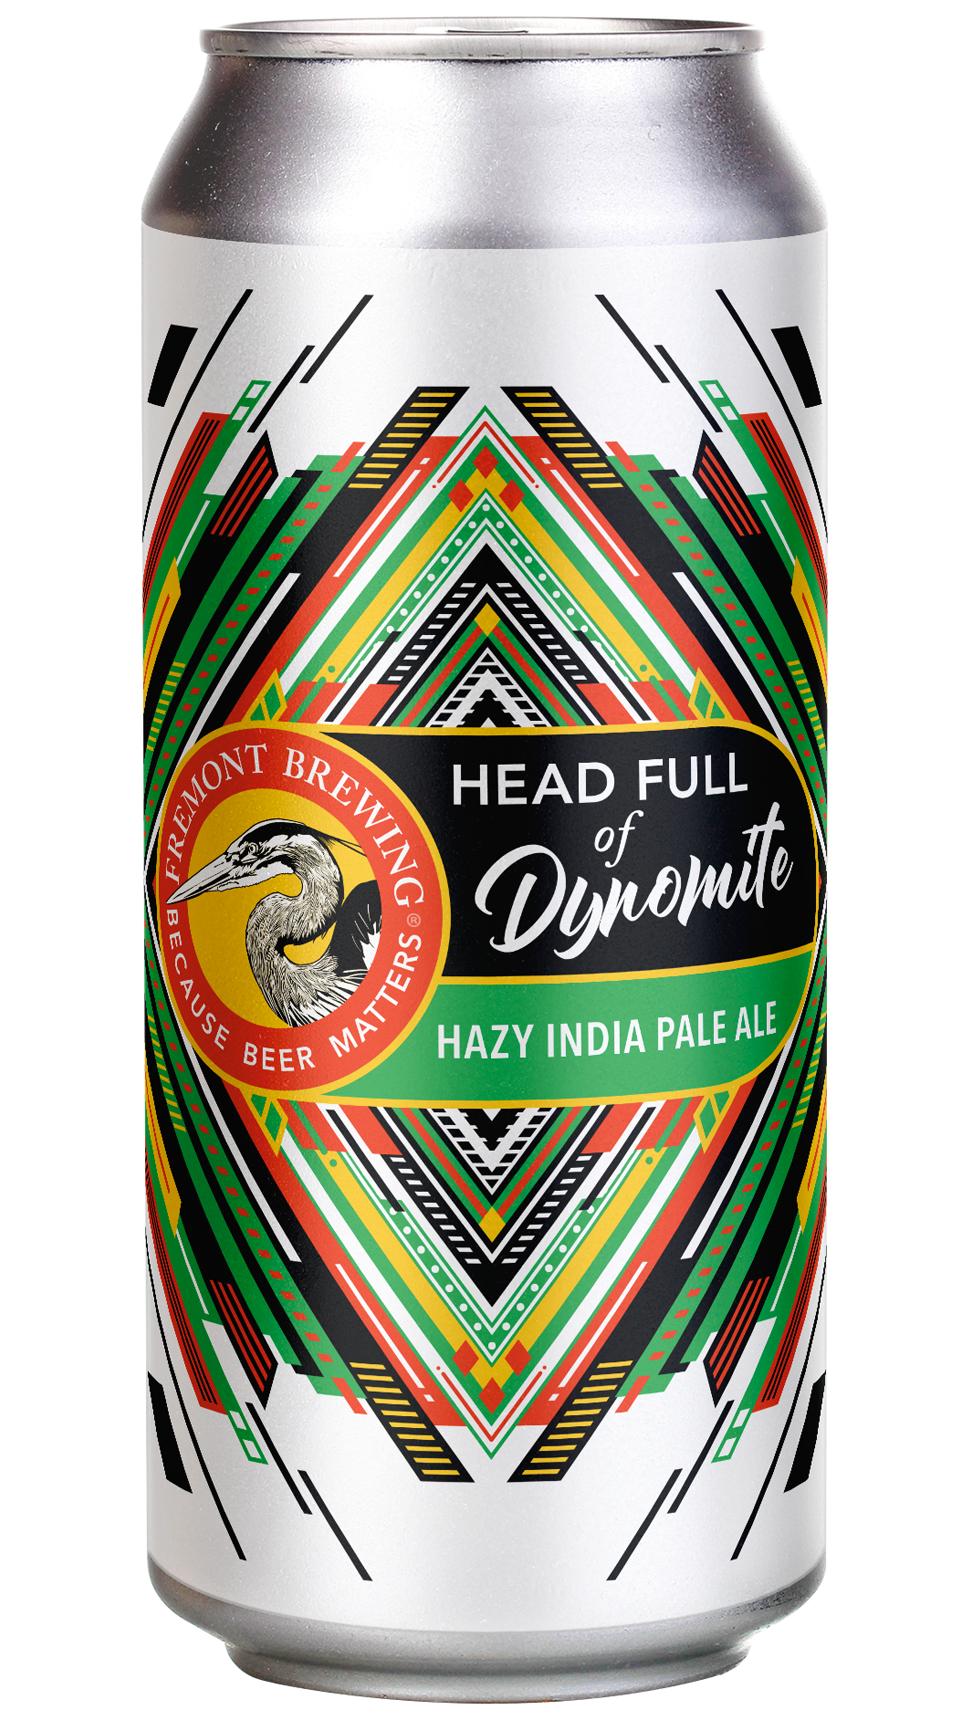 Head Full of Dynomite v.5